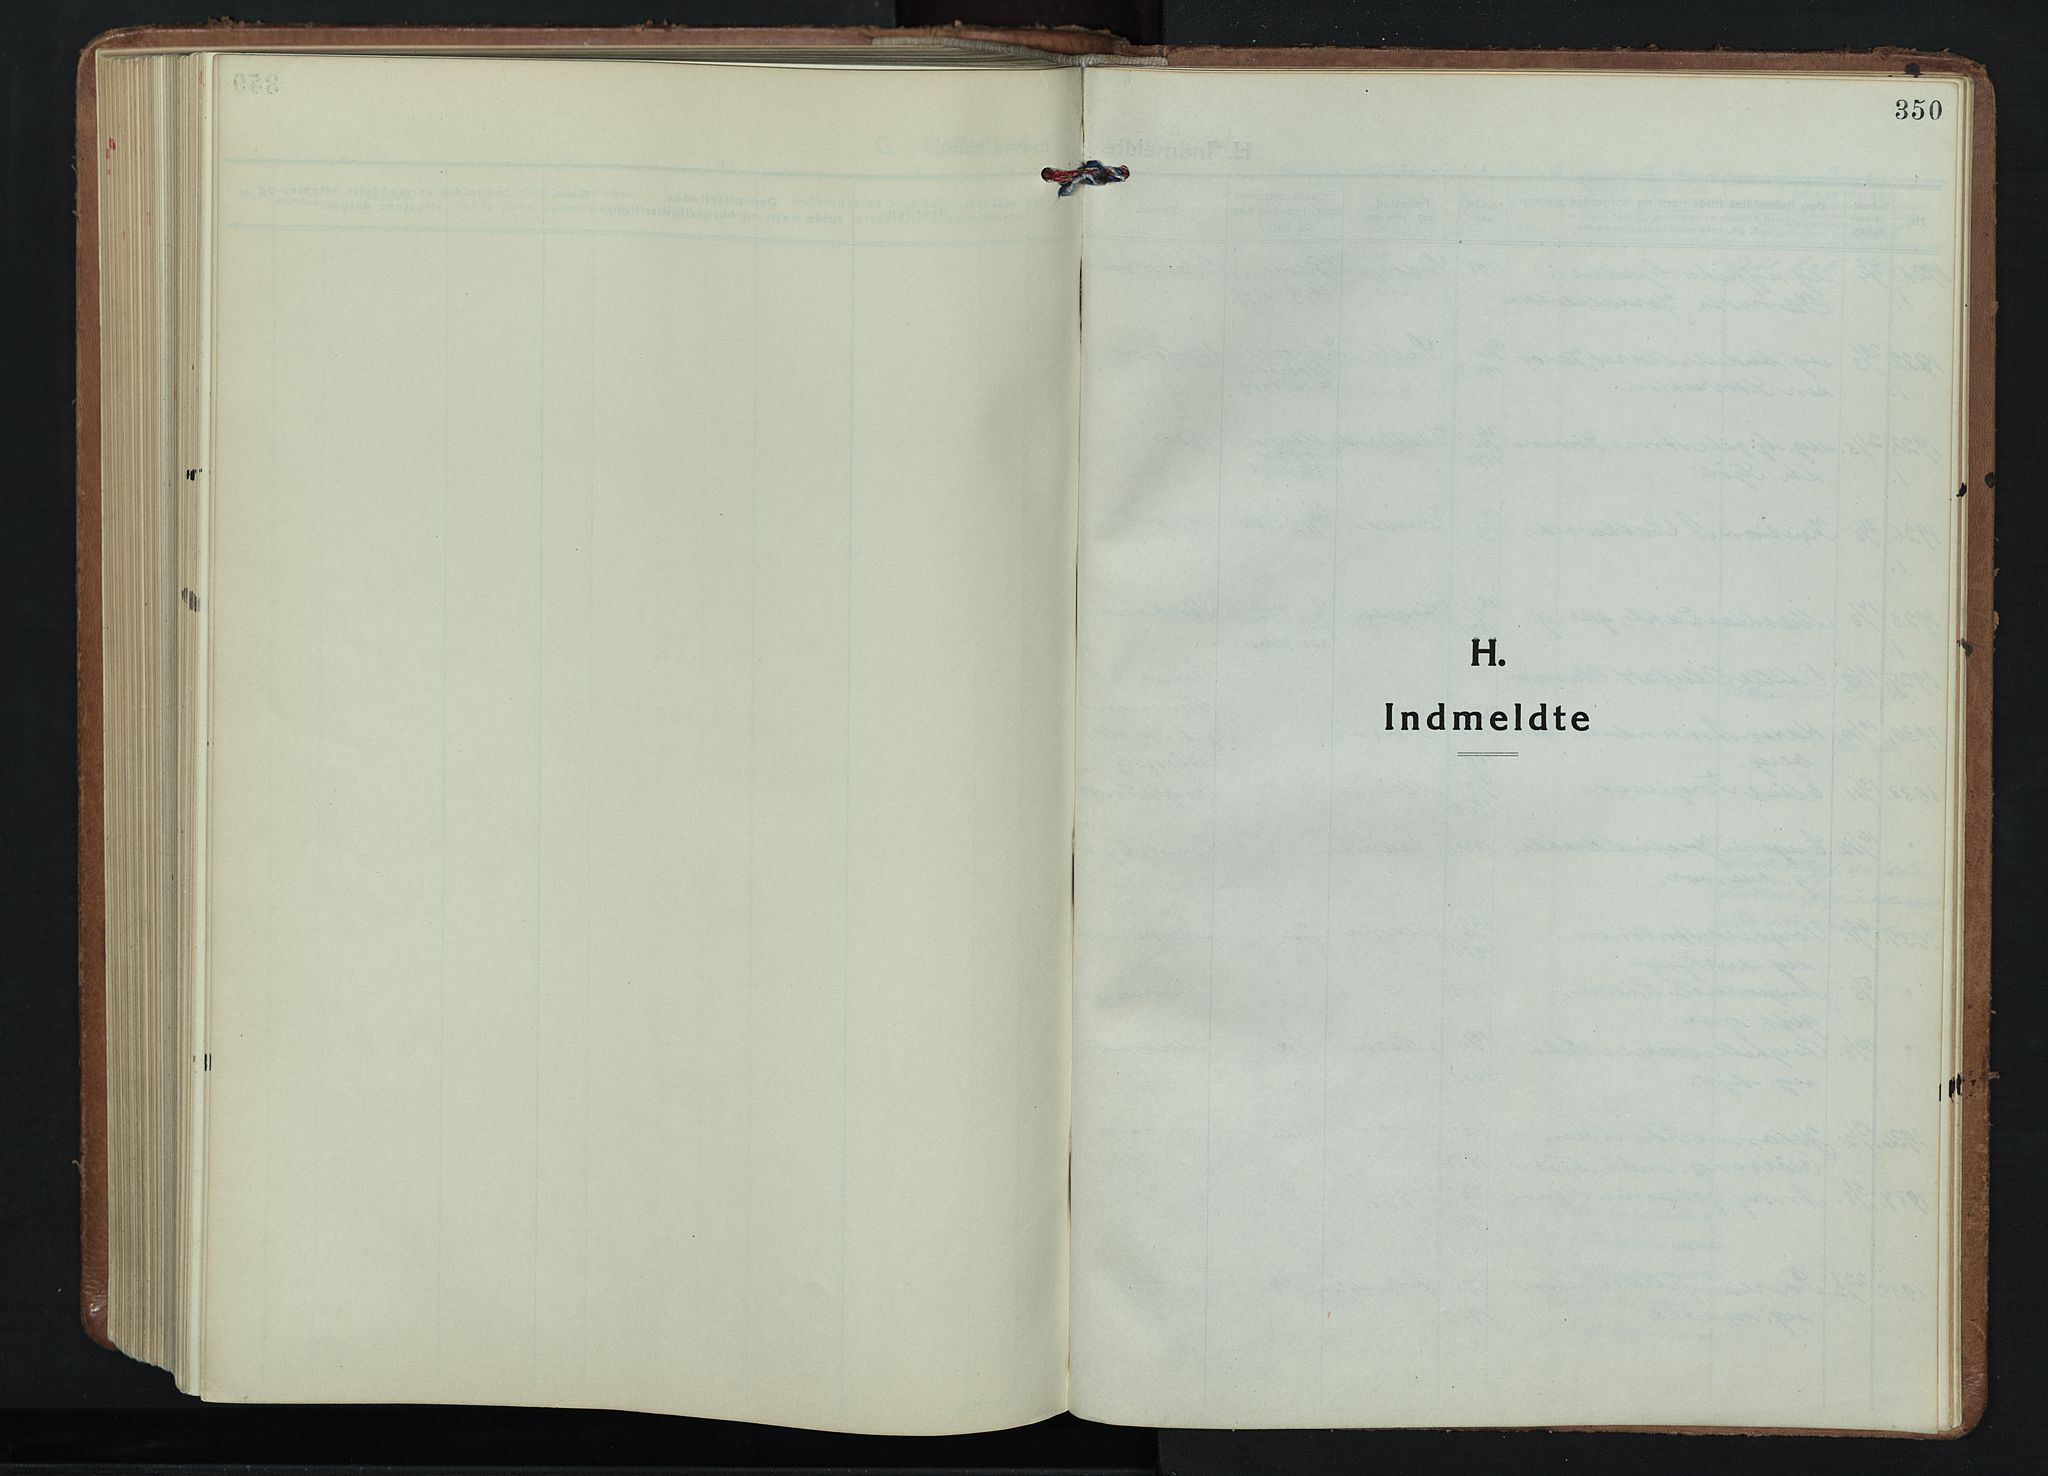 SAH, Fåberg prestekontor, H/Ha/Hab/L0015: Parish register (copy) no. 15, 1924-1949, p. 350